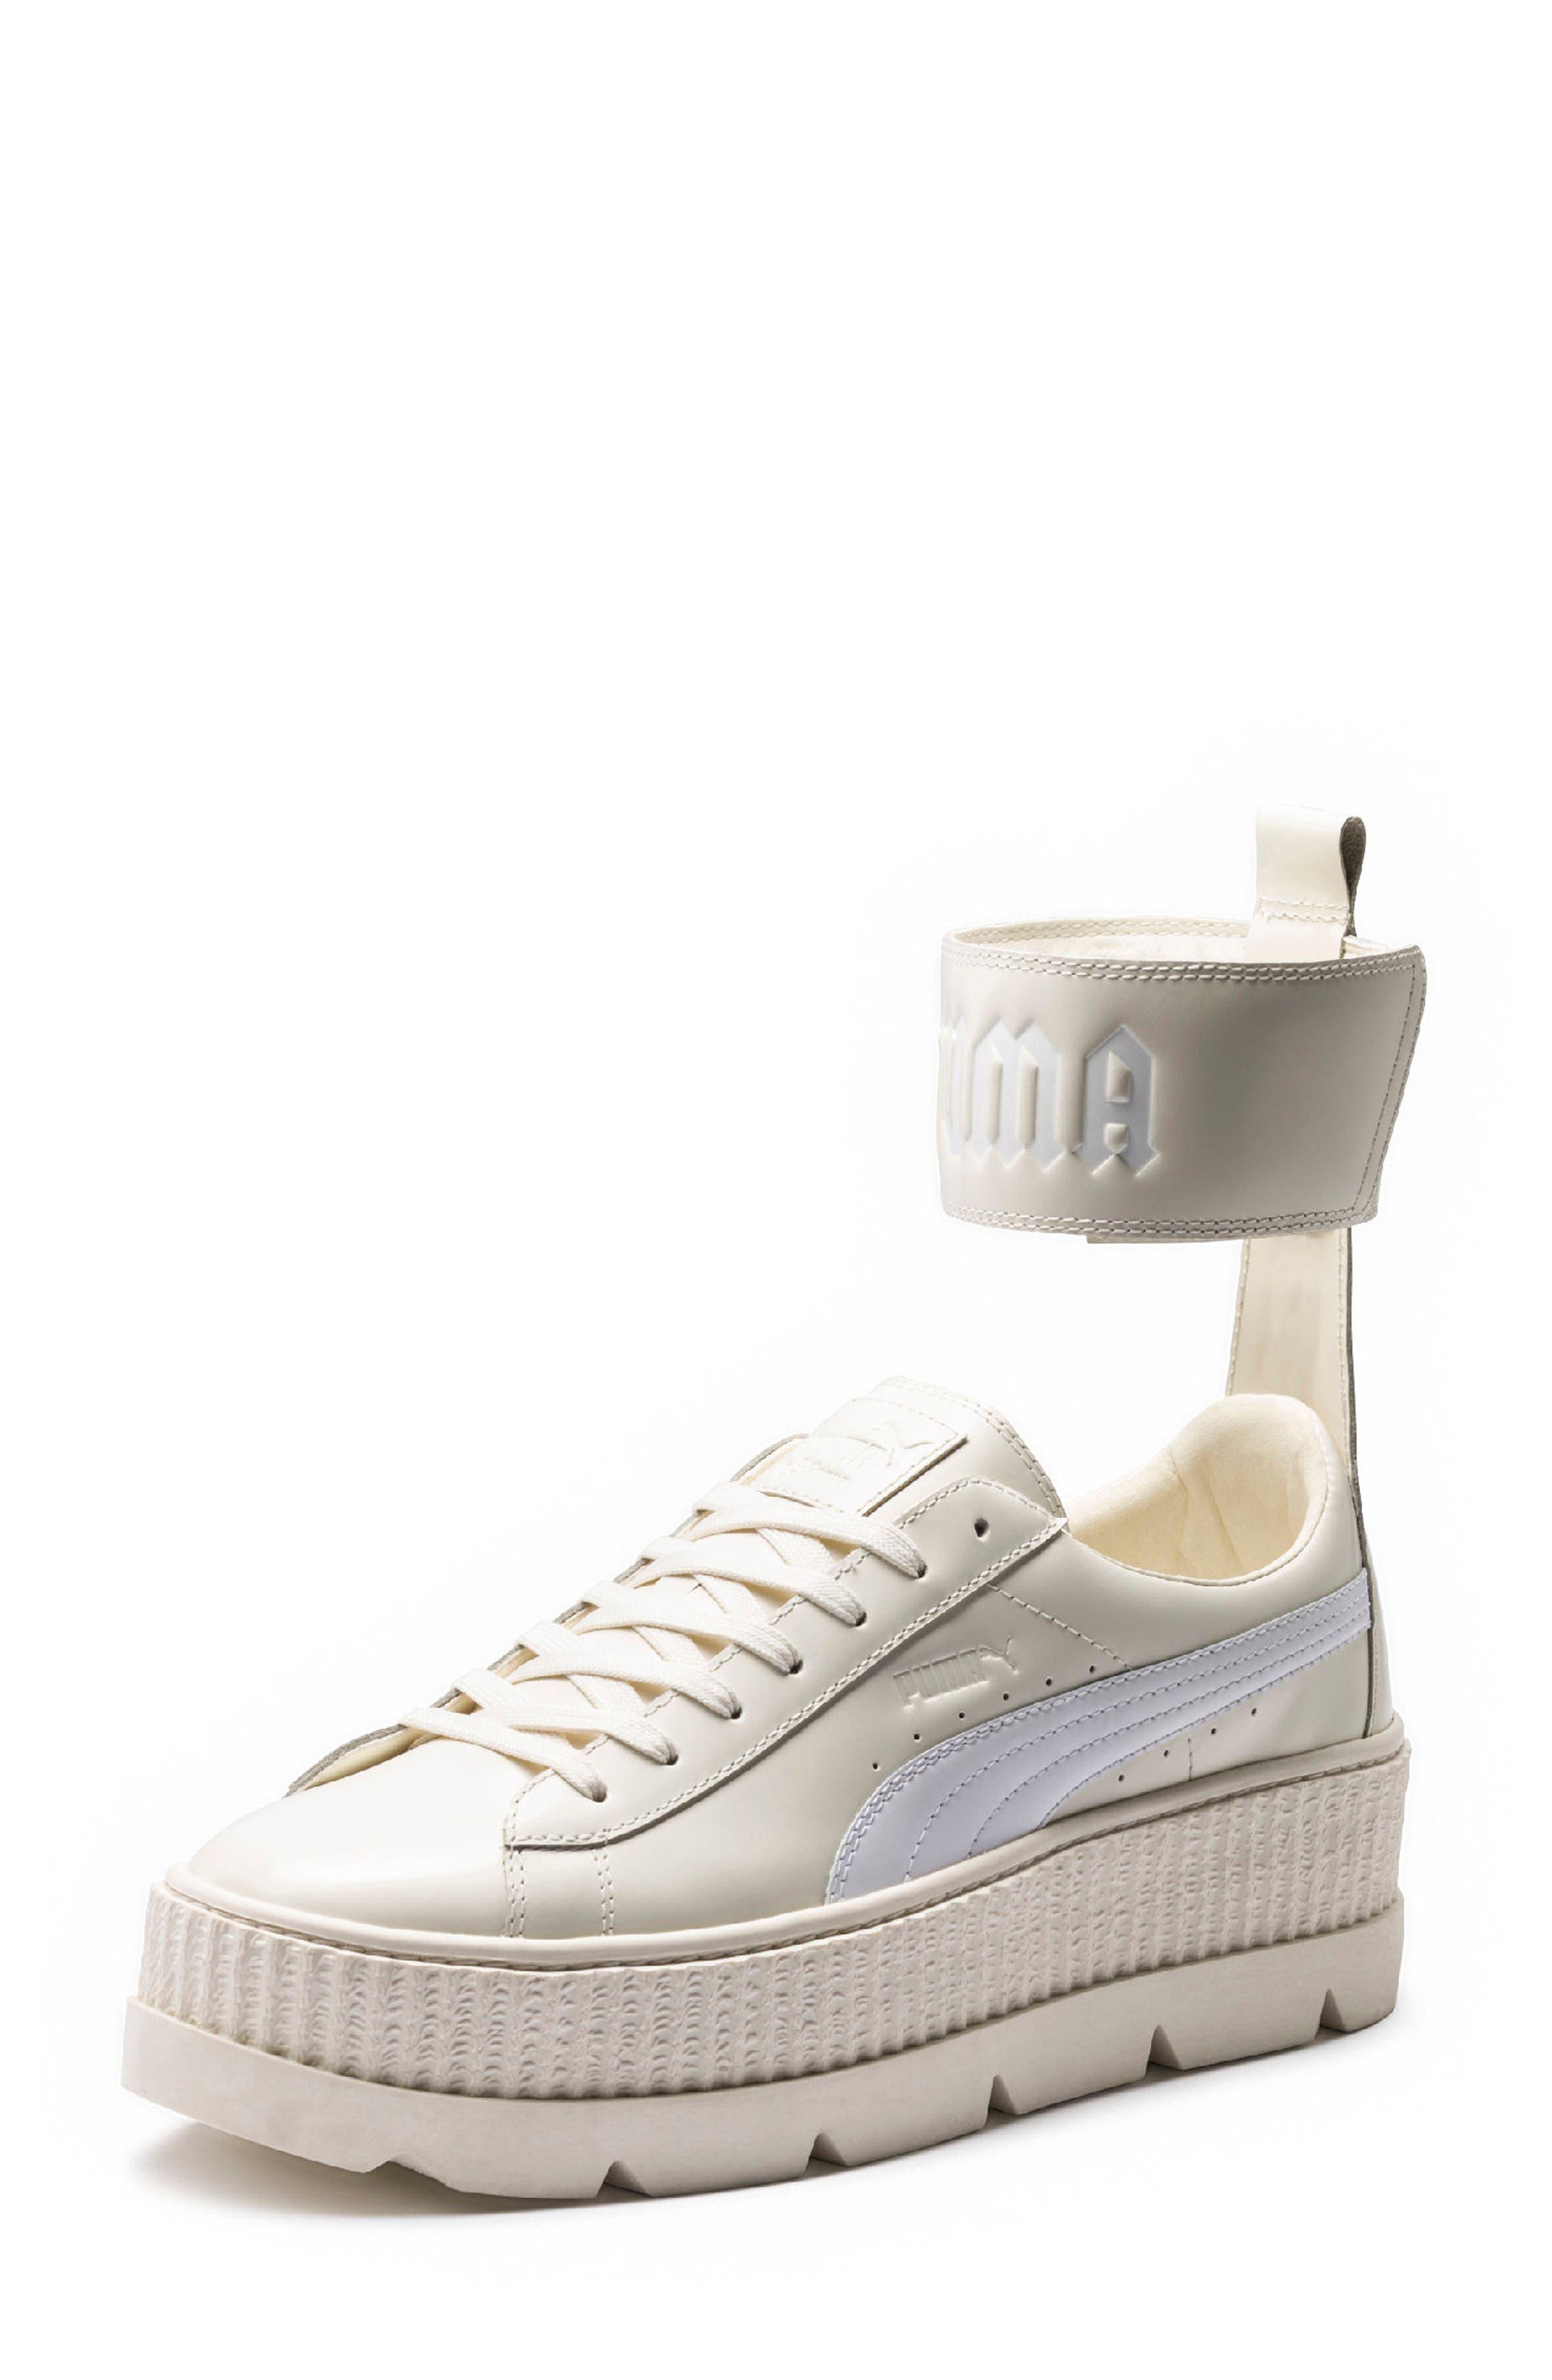 fenty creeper sneakers